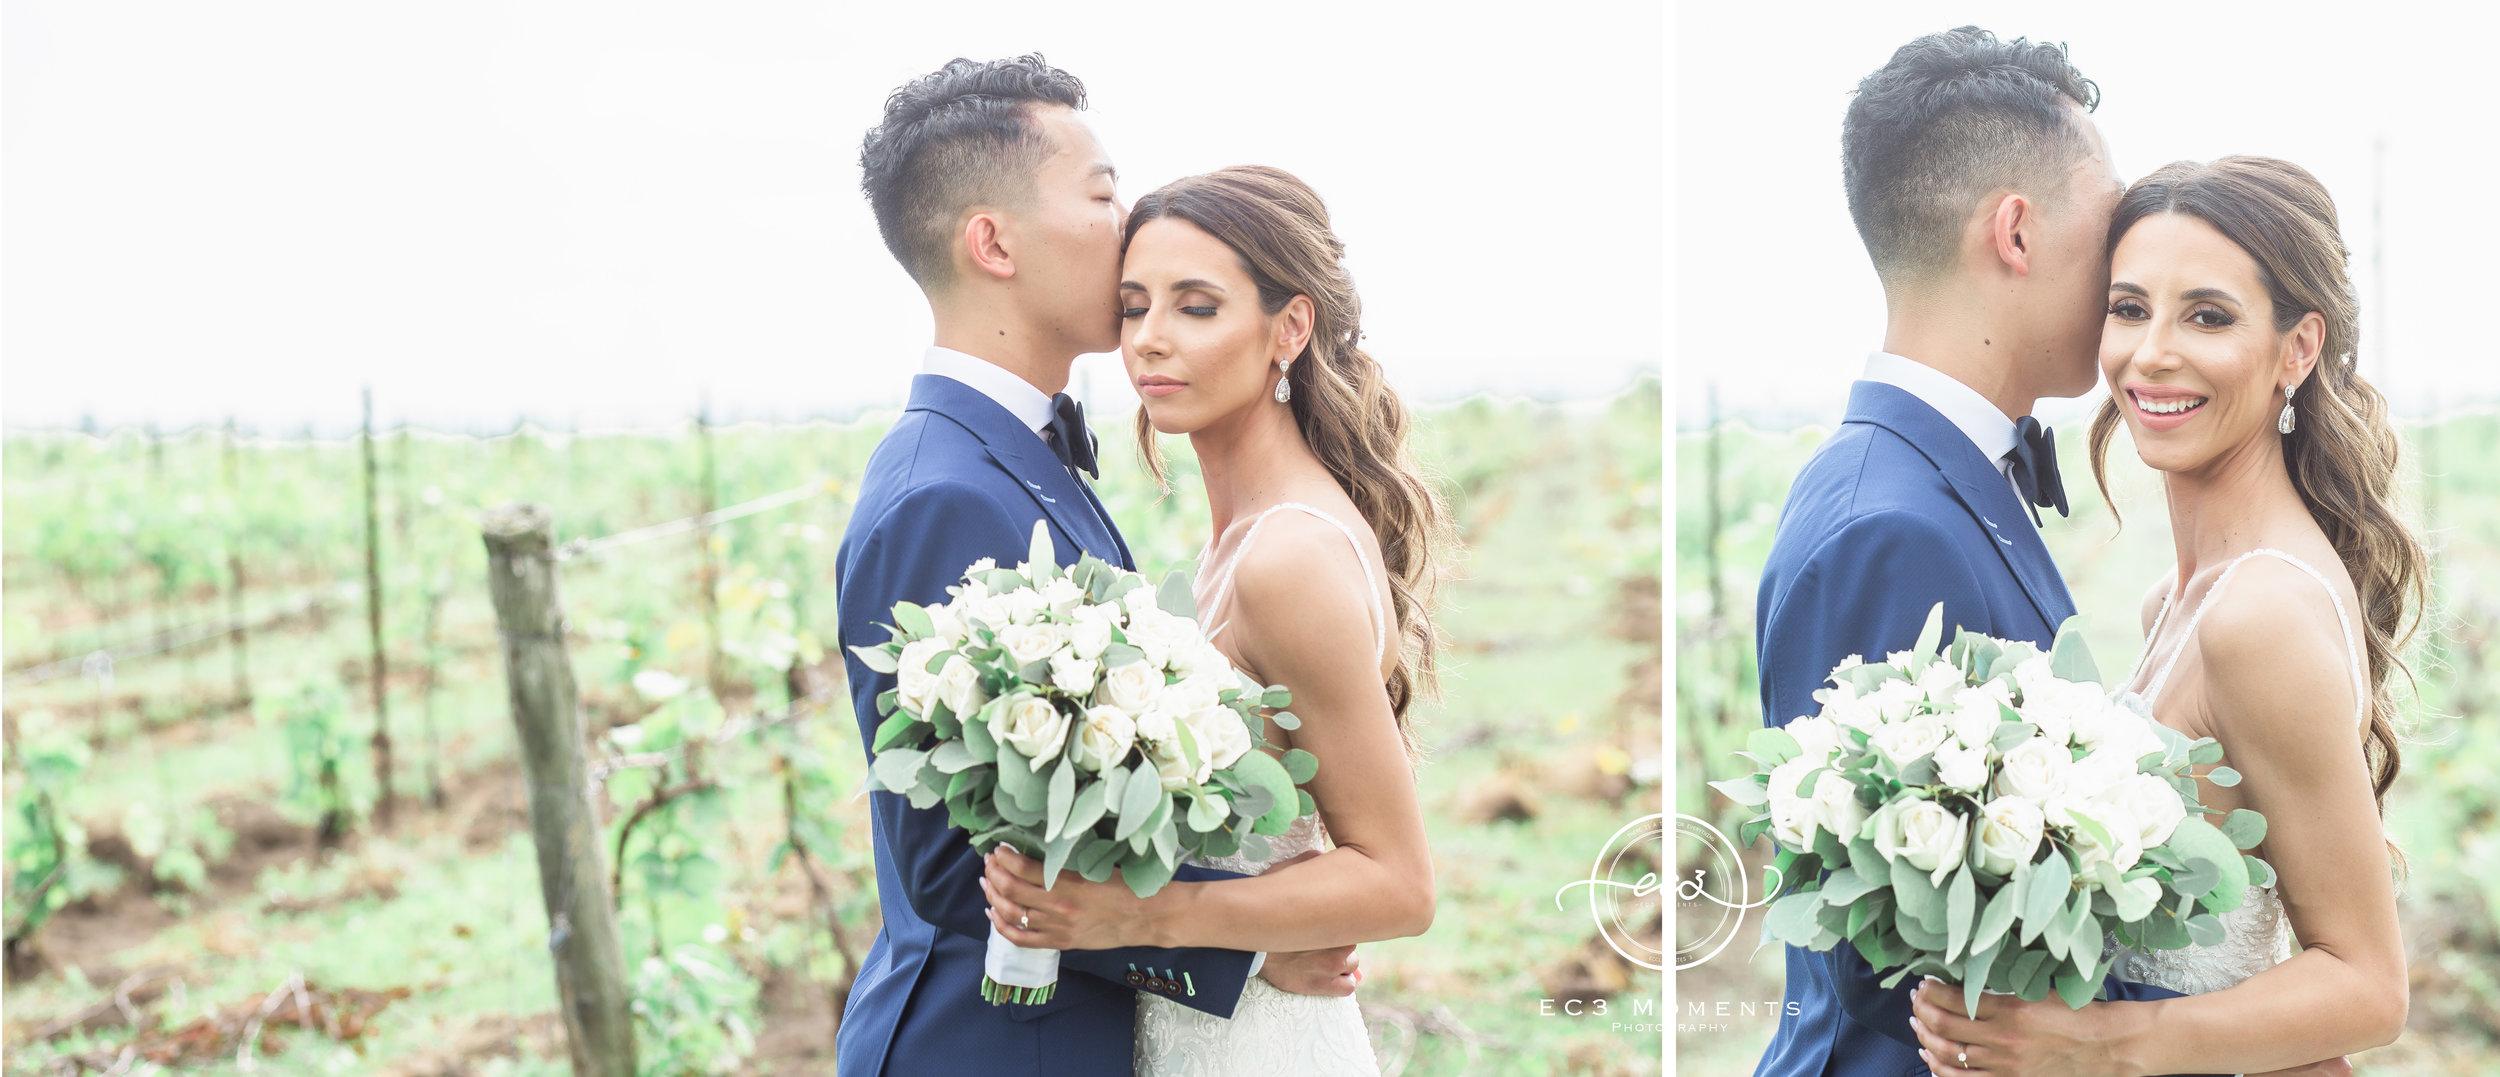 Laura & Ryan Holland Marsh Wineries Wedding 31.jpg